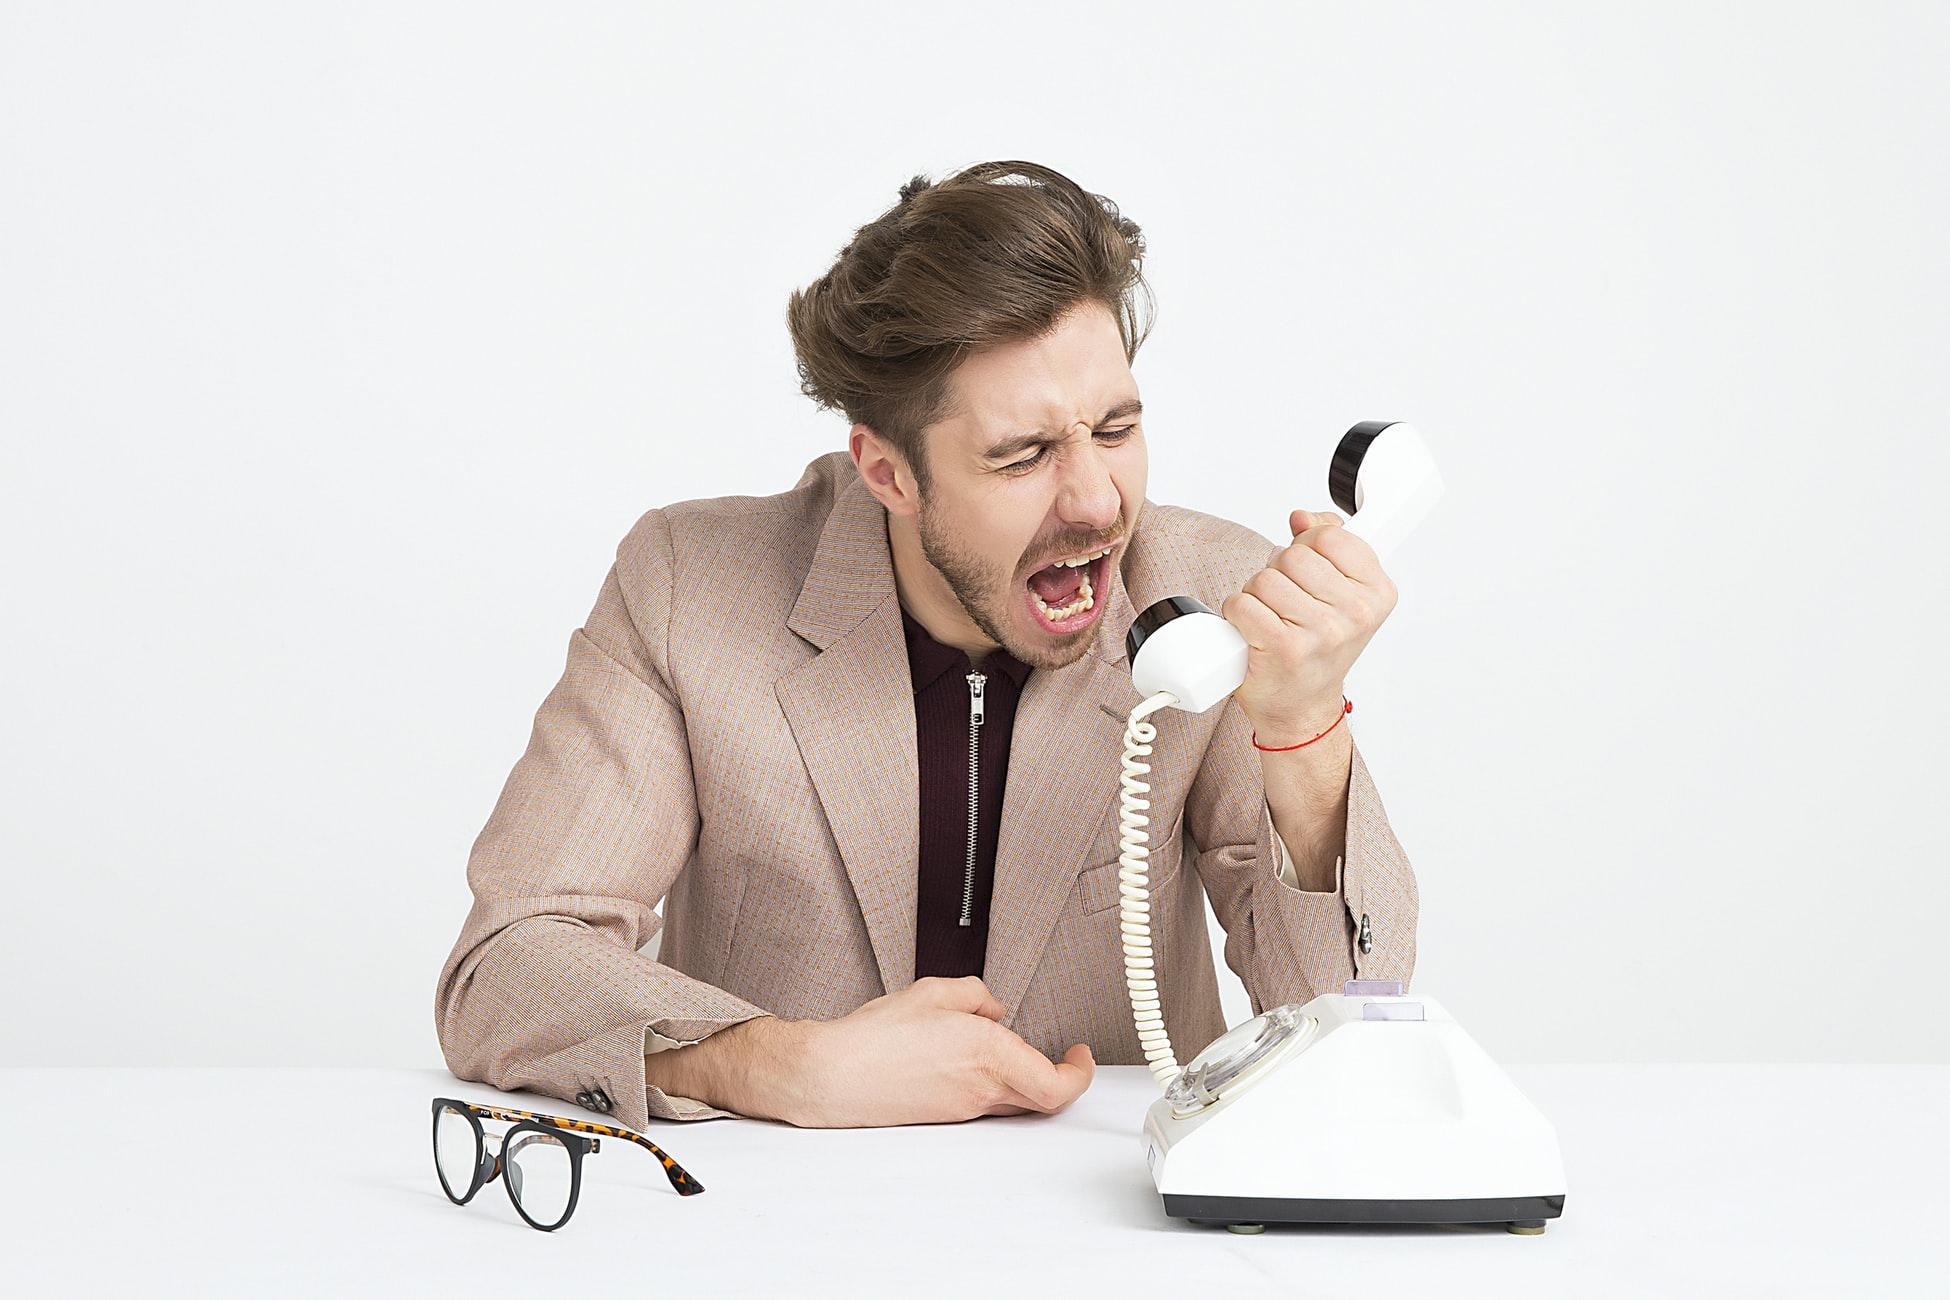 a man yelling via the phone